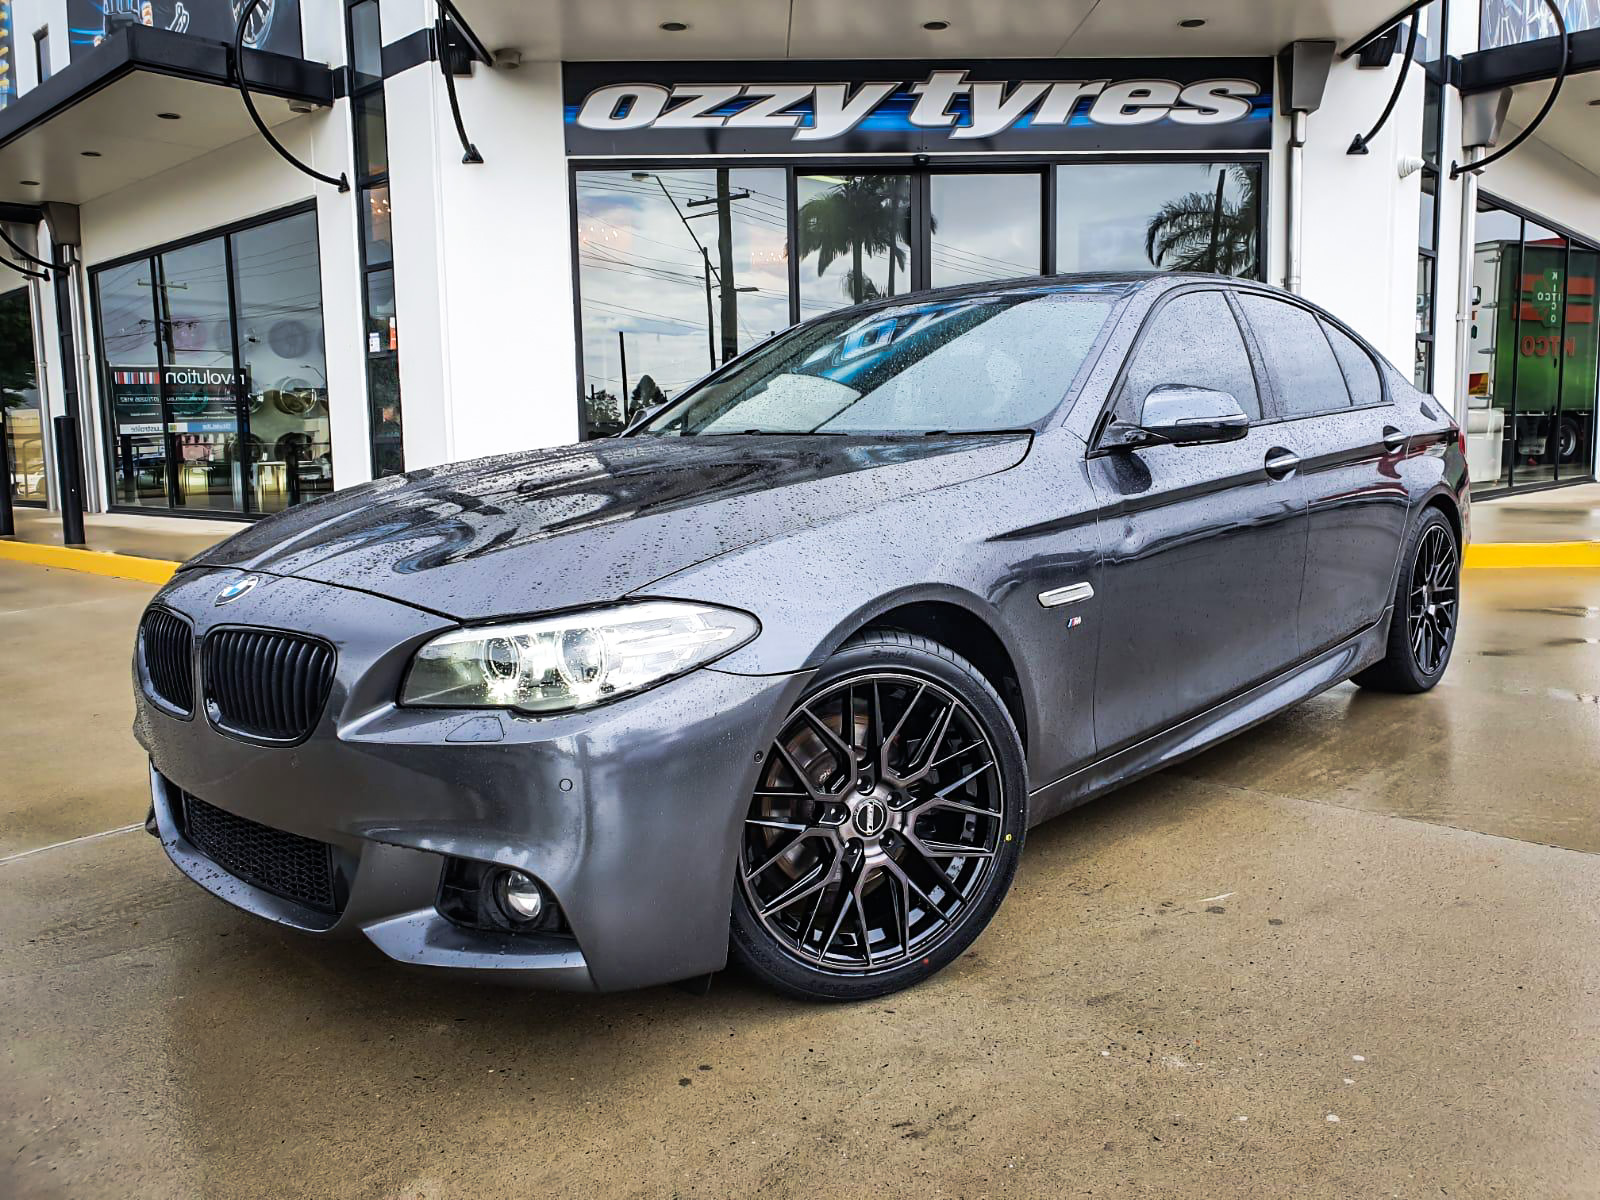 BMW on hussla Lit dark tint 1 of 4 1